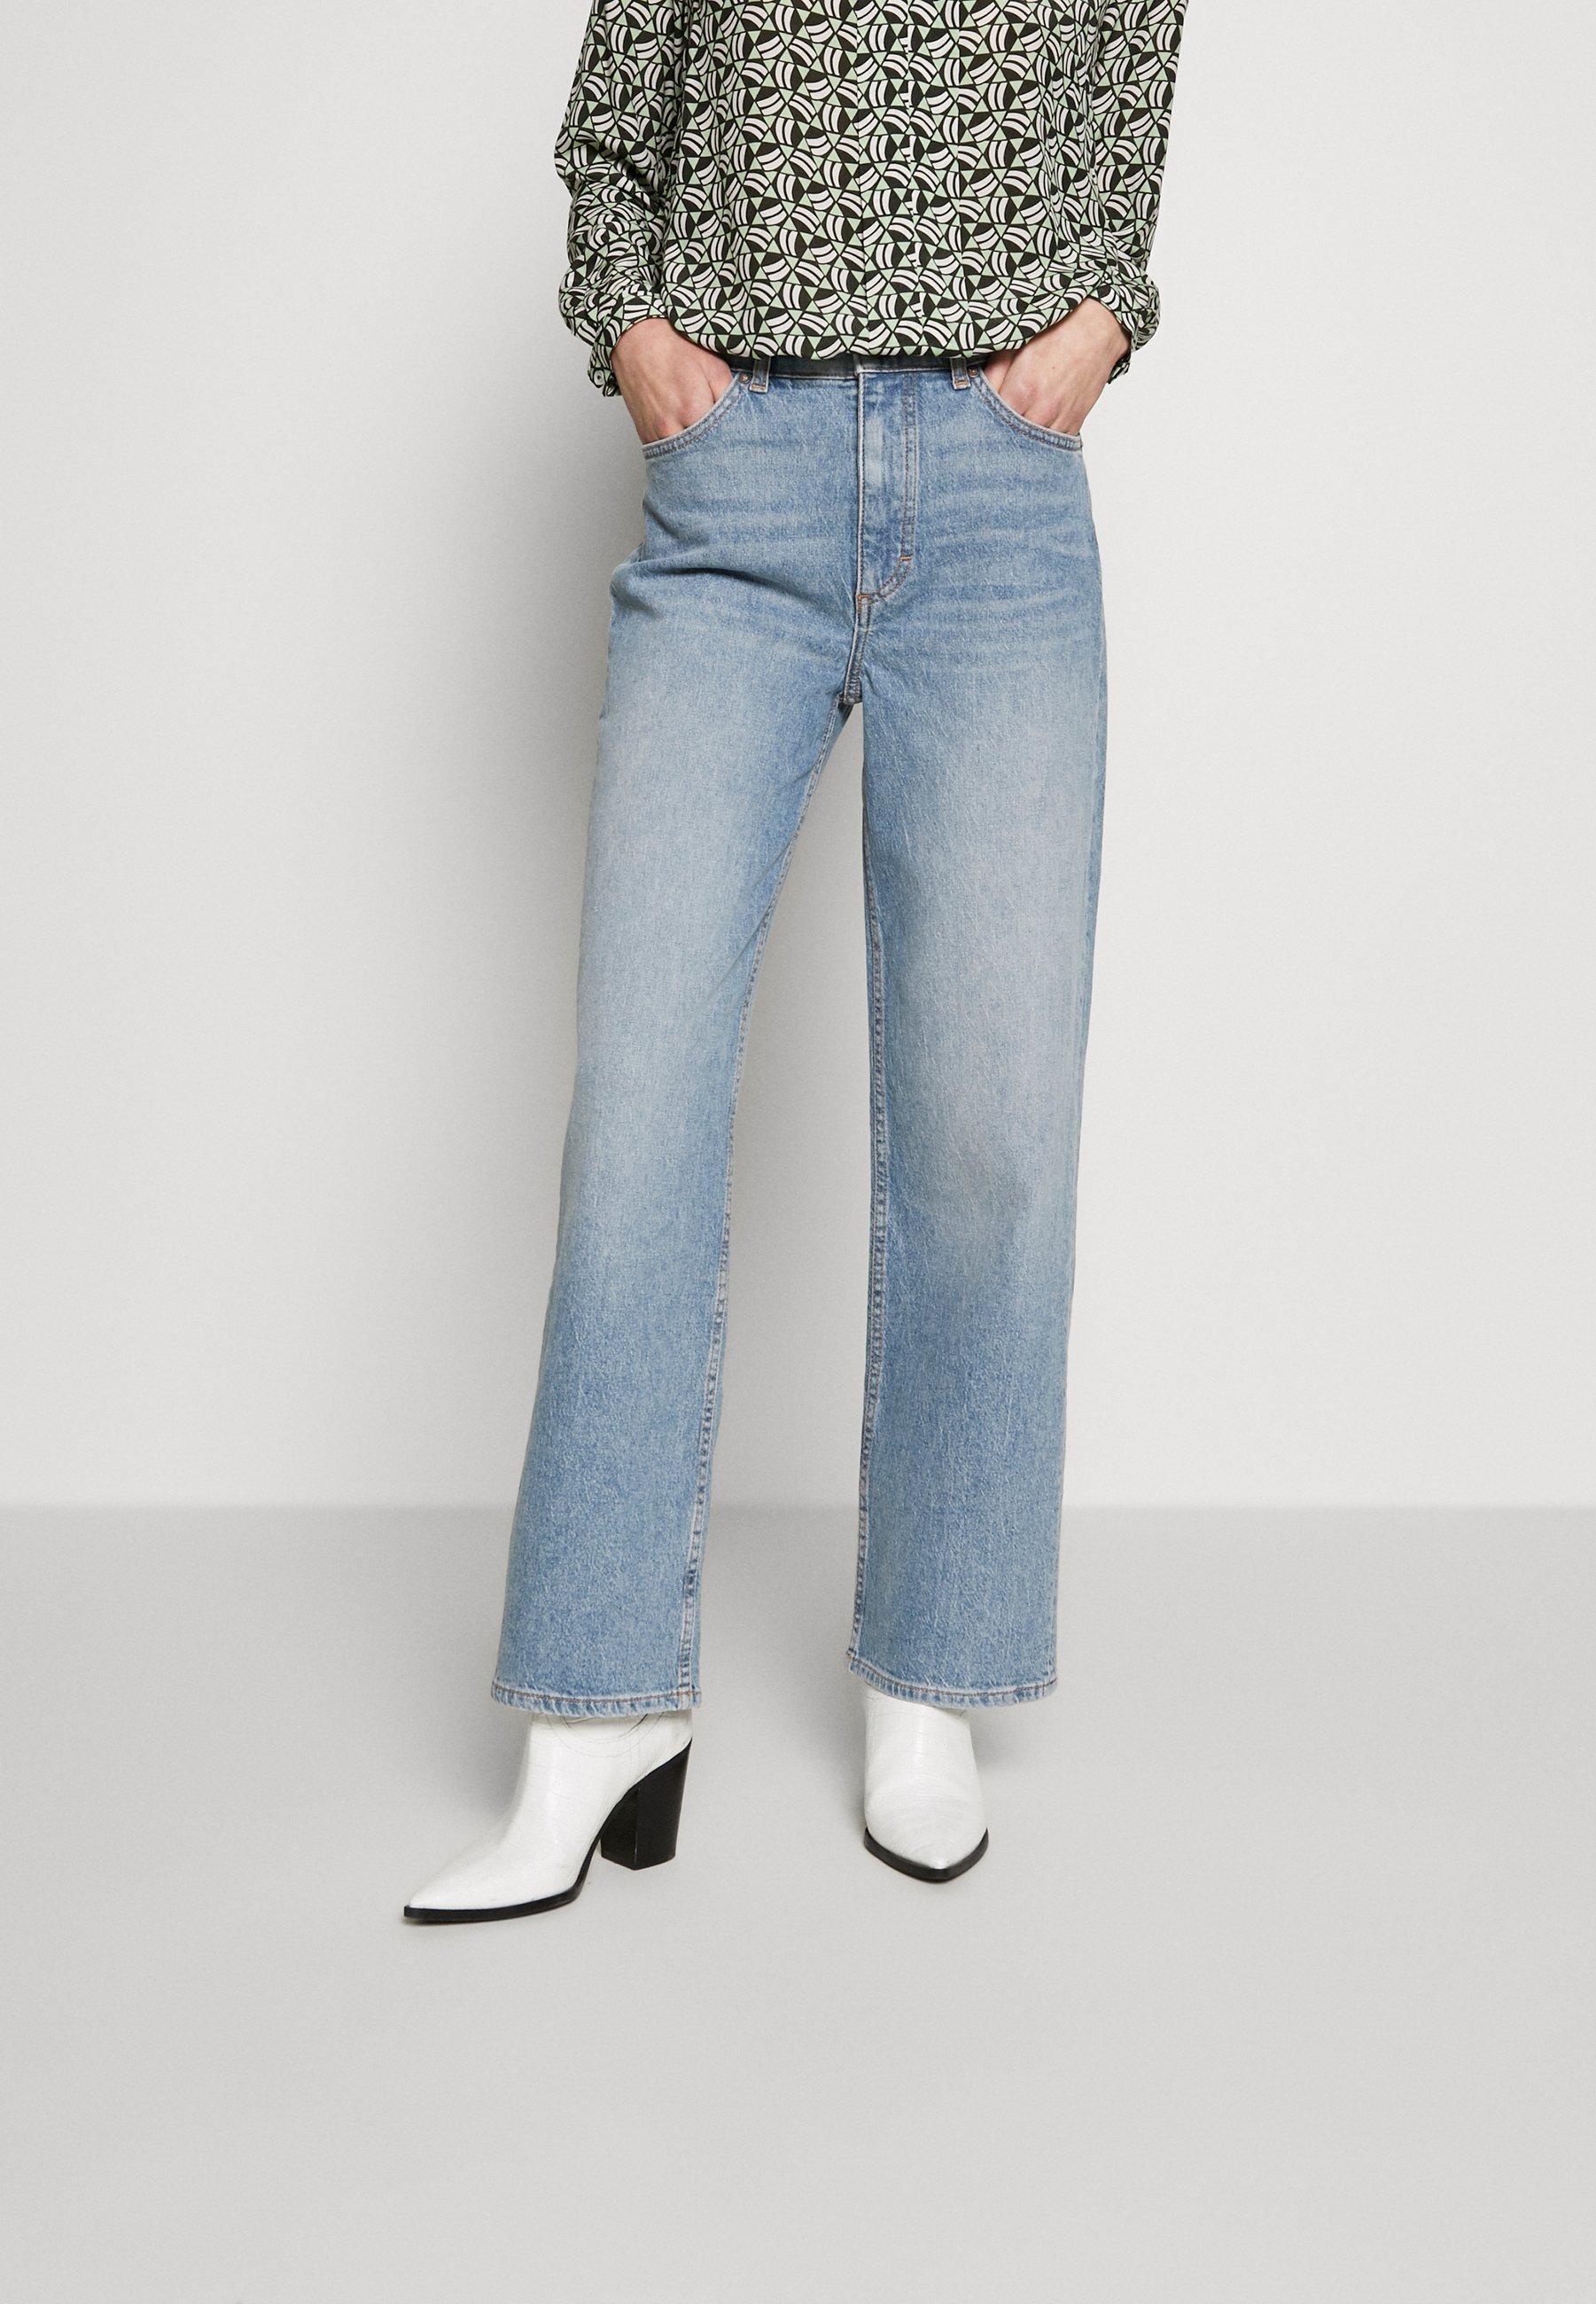 Marc O'Polo TROUSERS HIGH WAIST STRAIGHT WIDE LEG REGULAR LENGTH - Jean boyfriend - light blue wash - Jeans Femme vLzU7